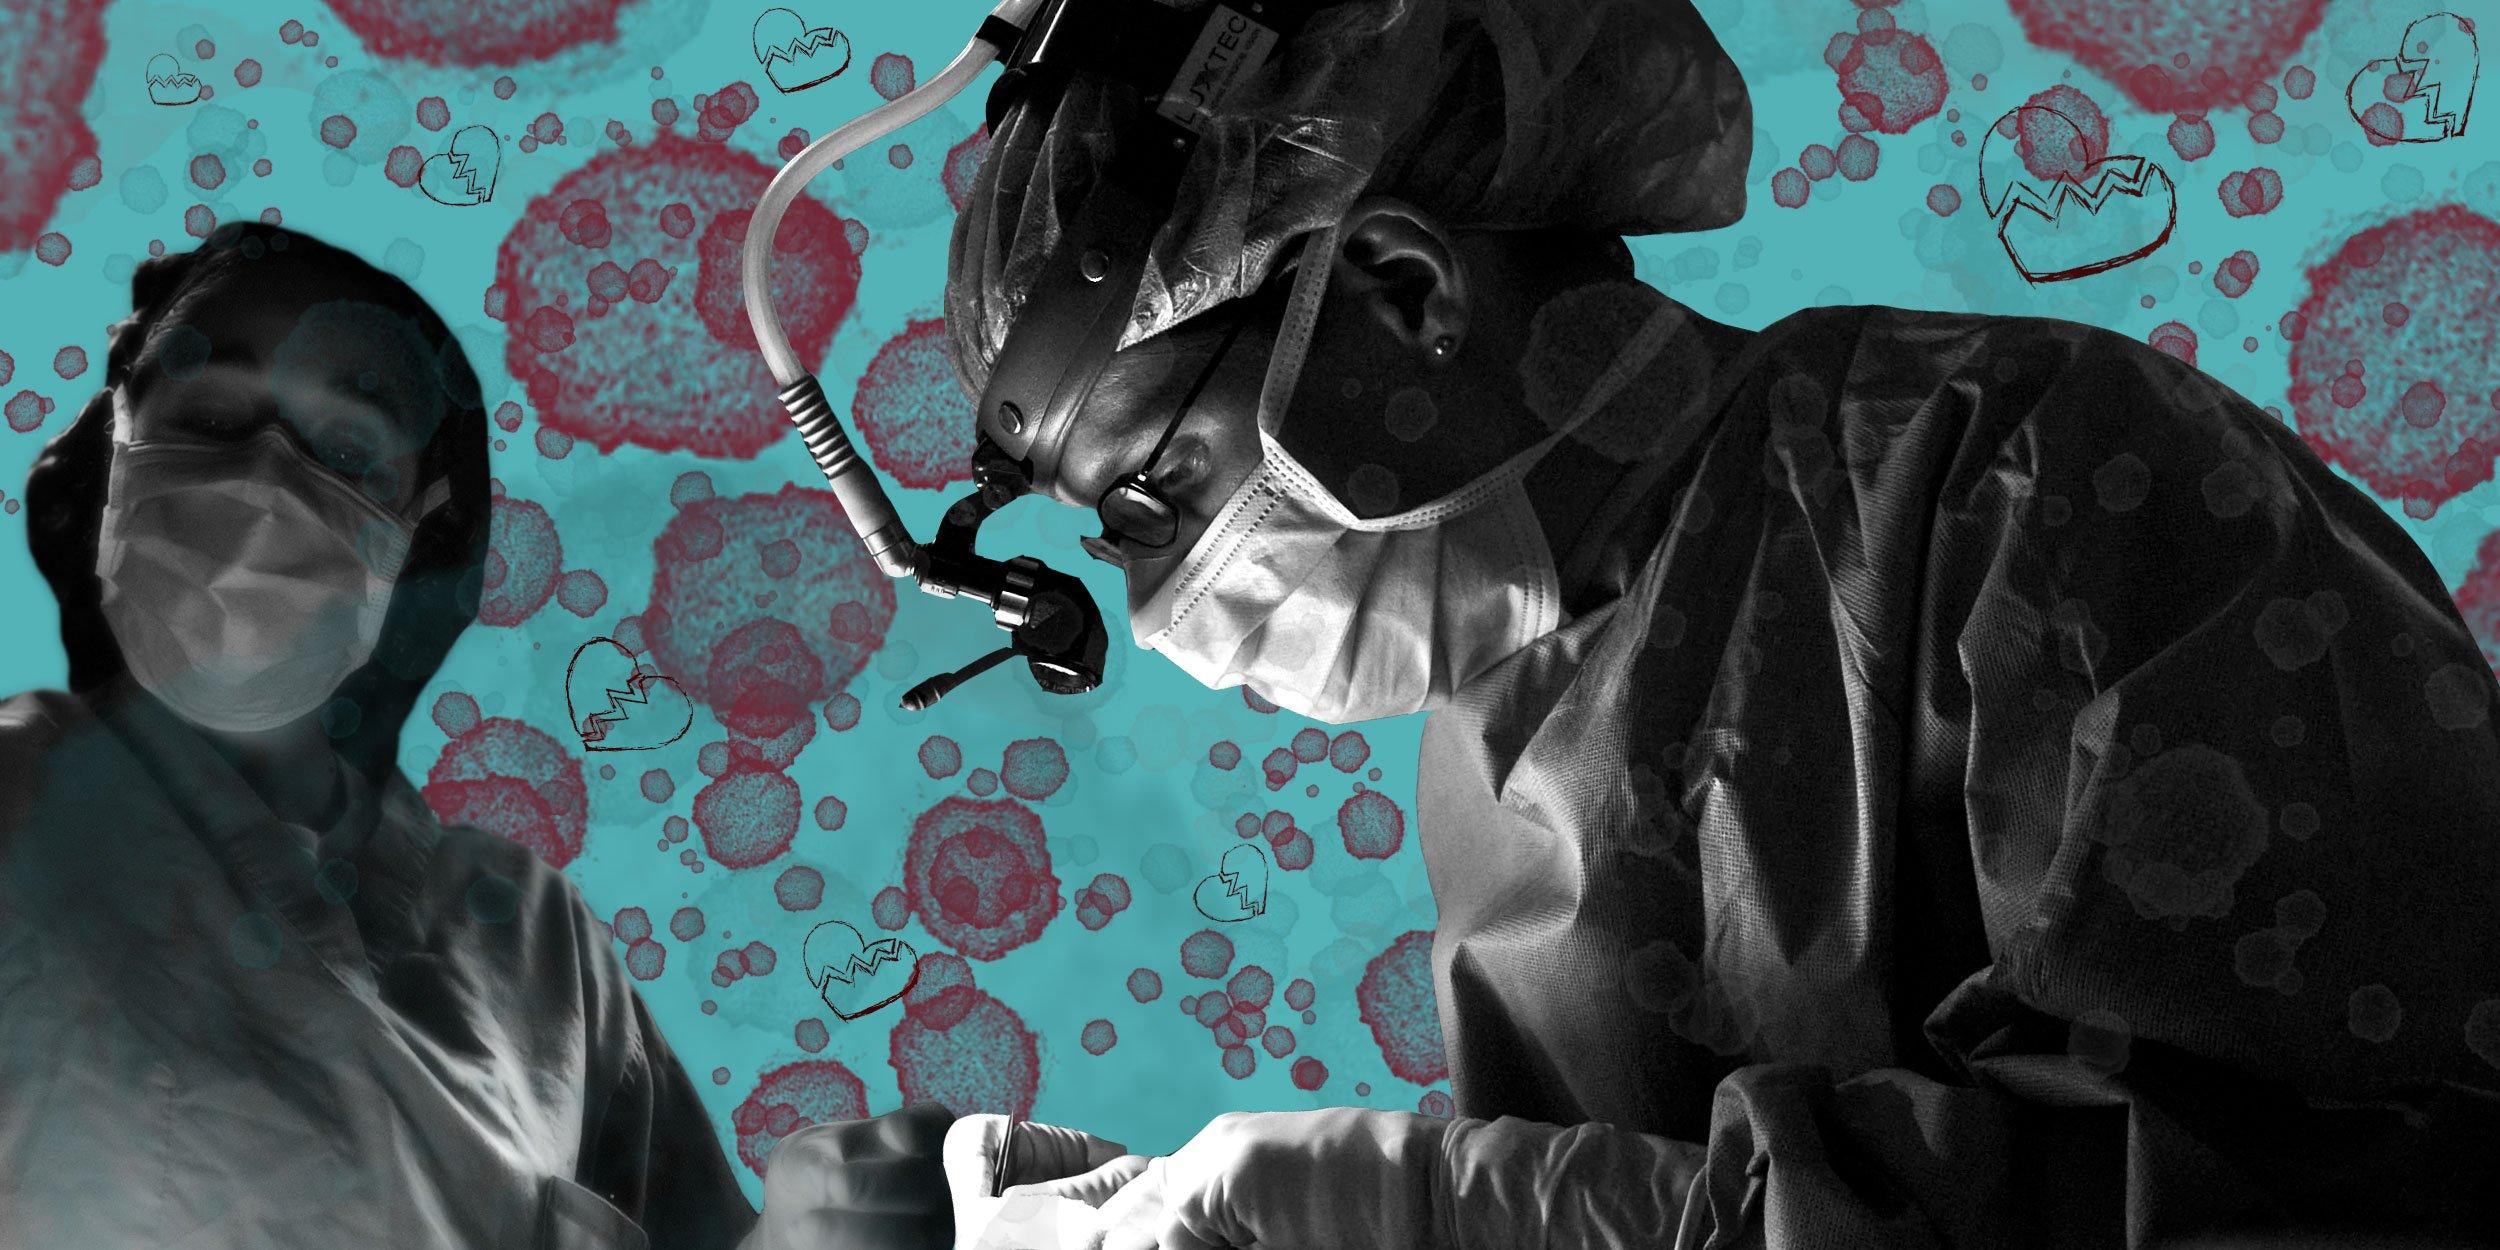 Investigation: Hospitals Are Denying Organ Transplants To Marijuana Patients